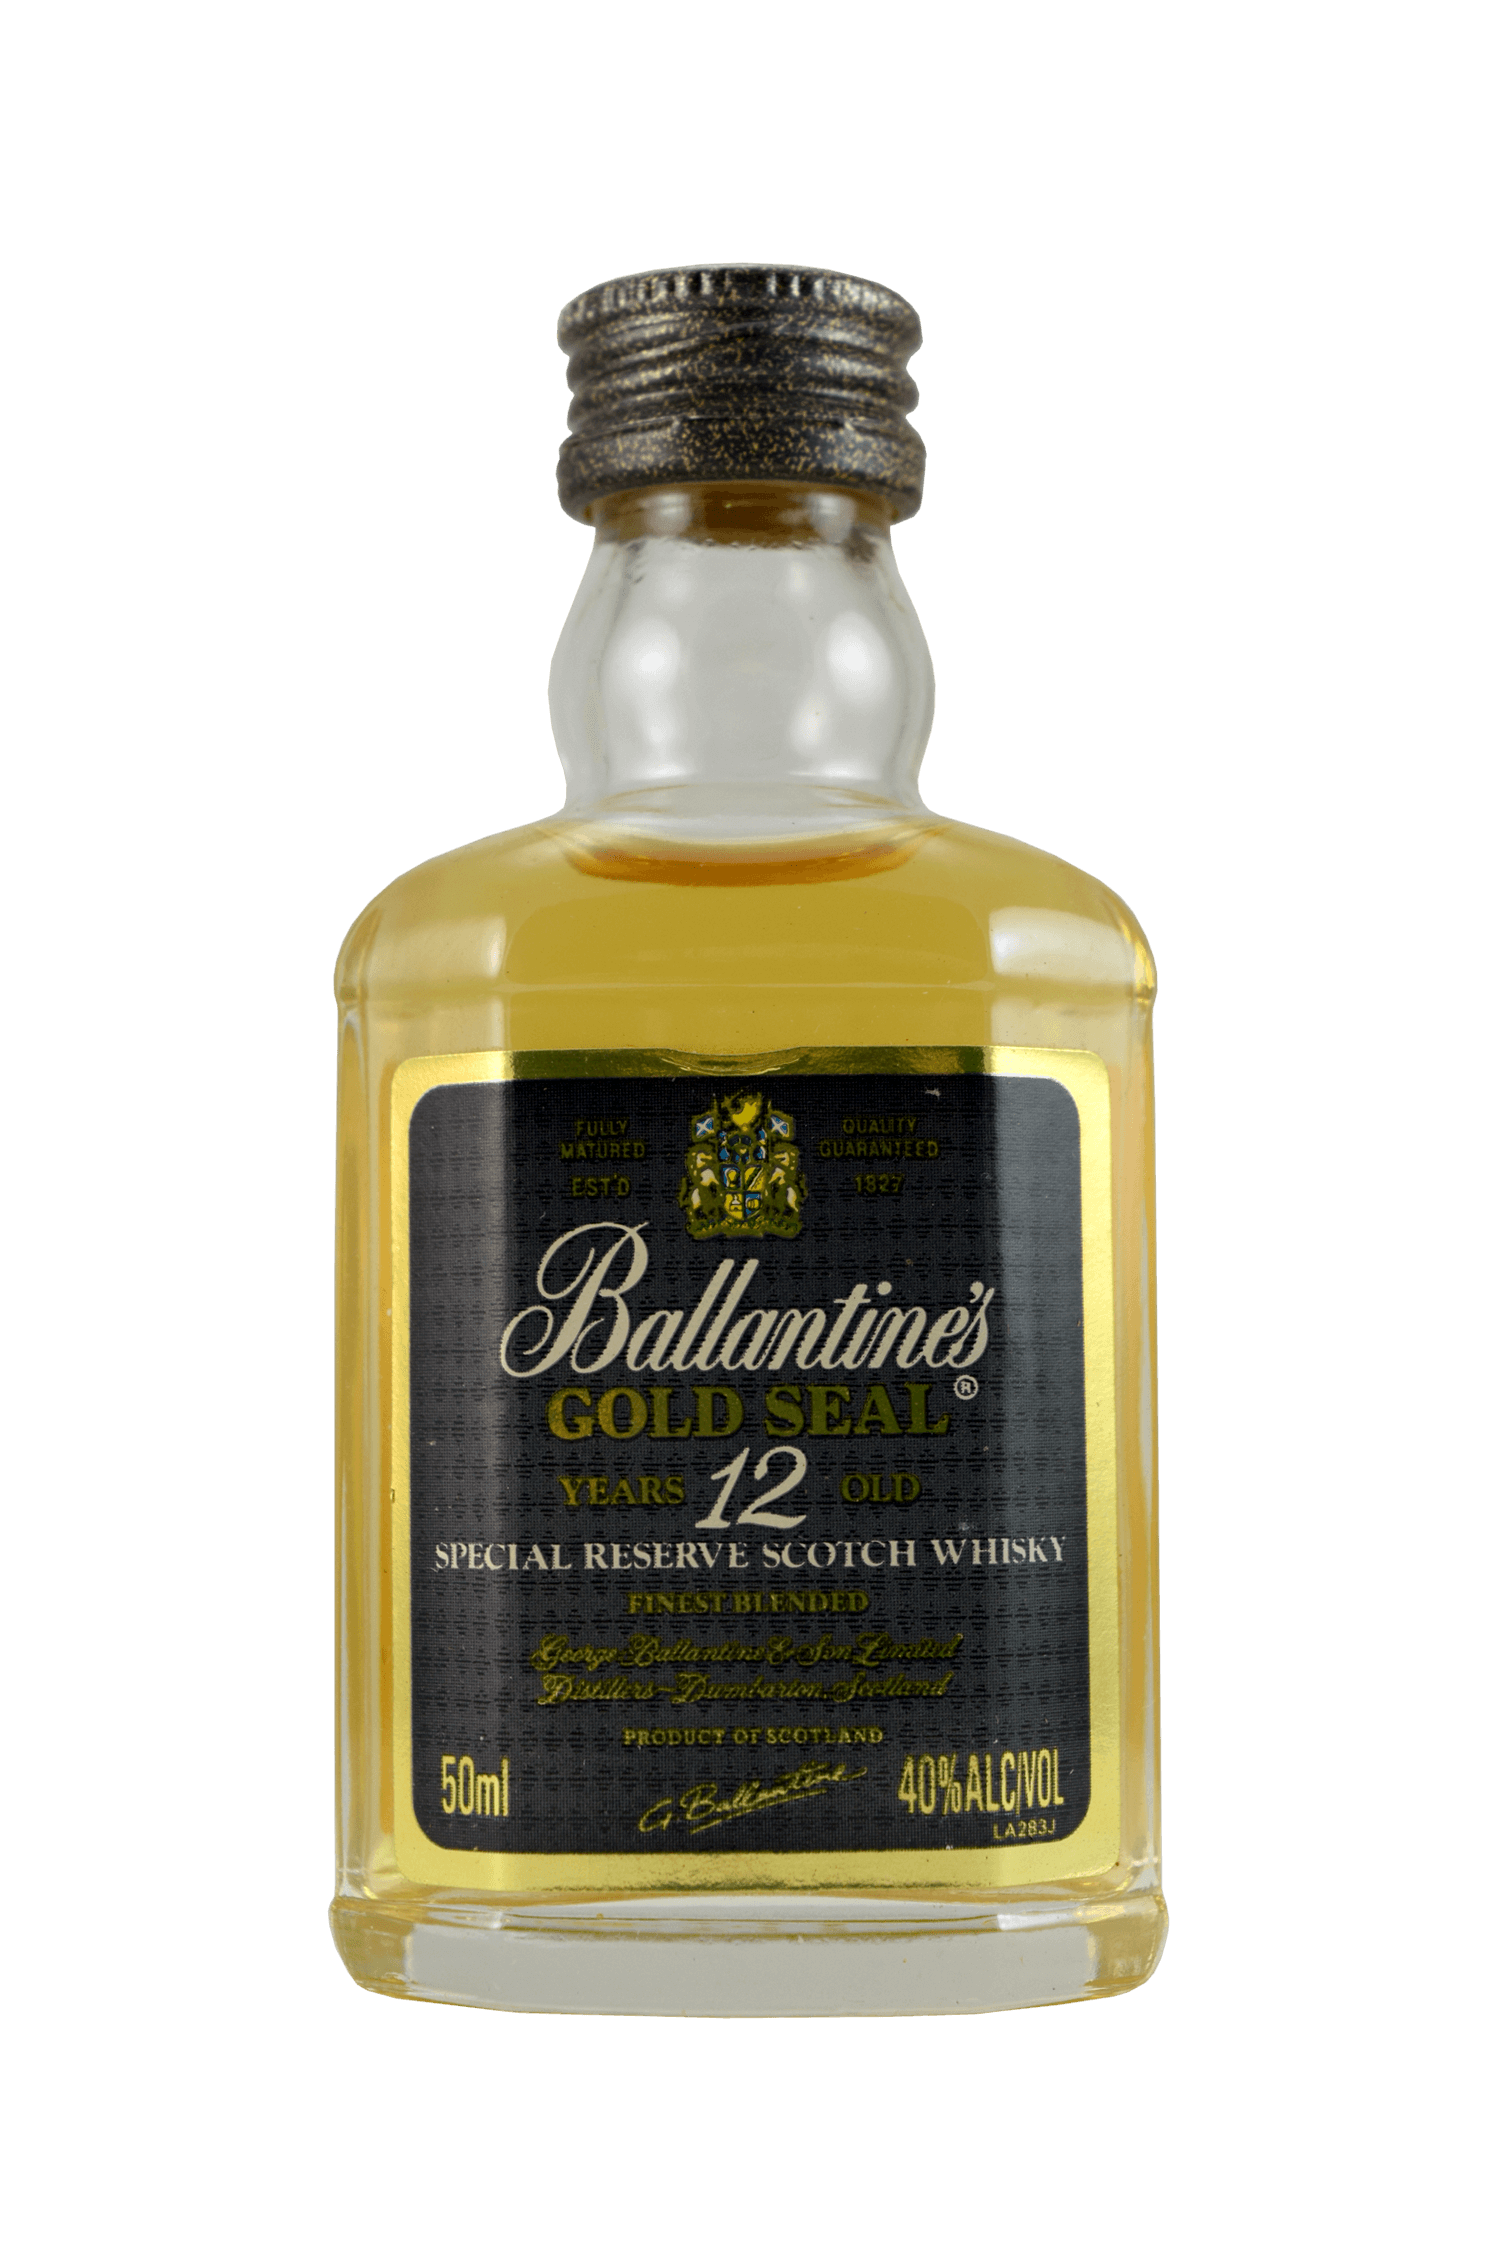 Ballantines Gold Seal